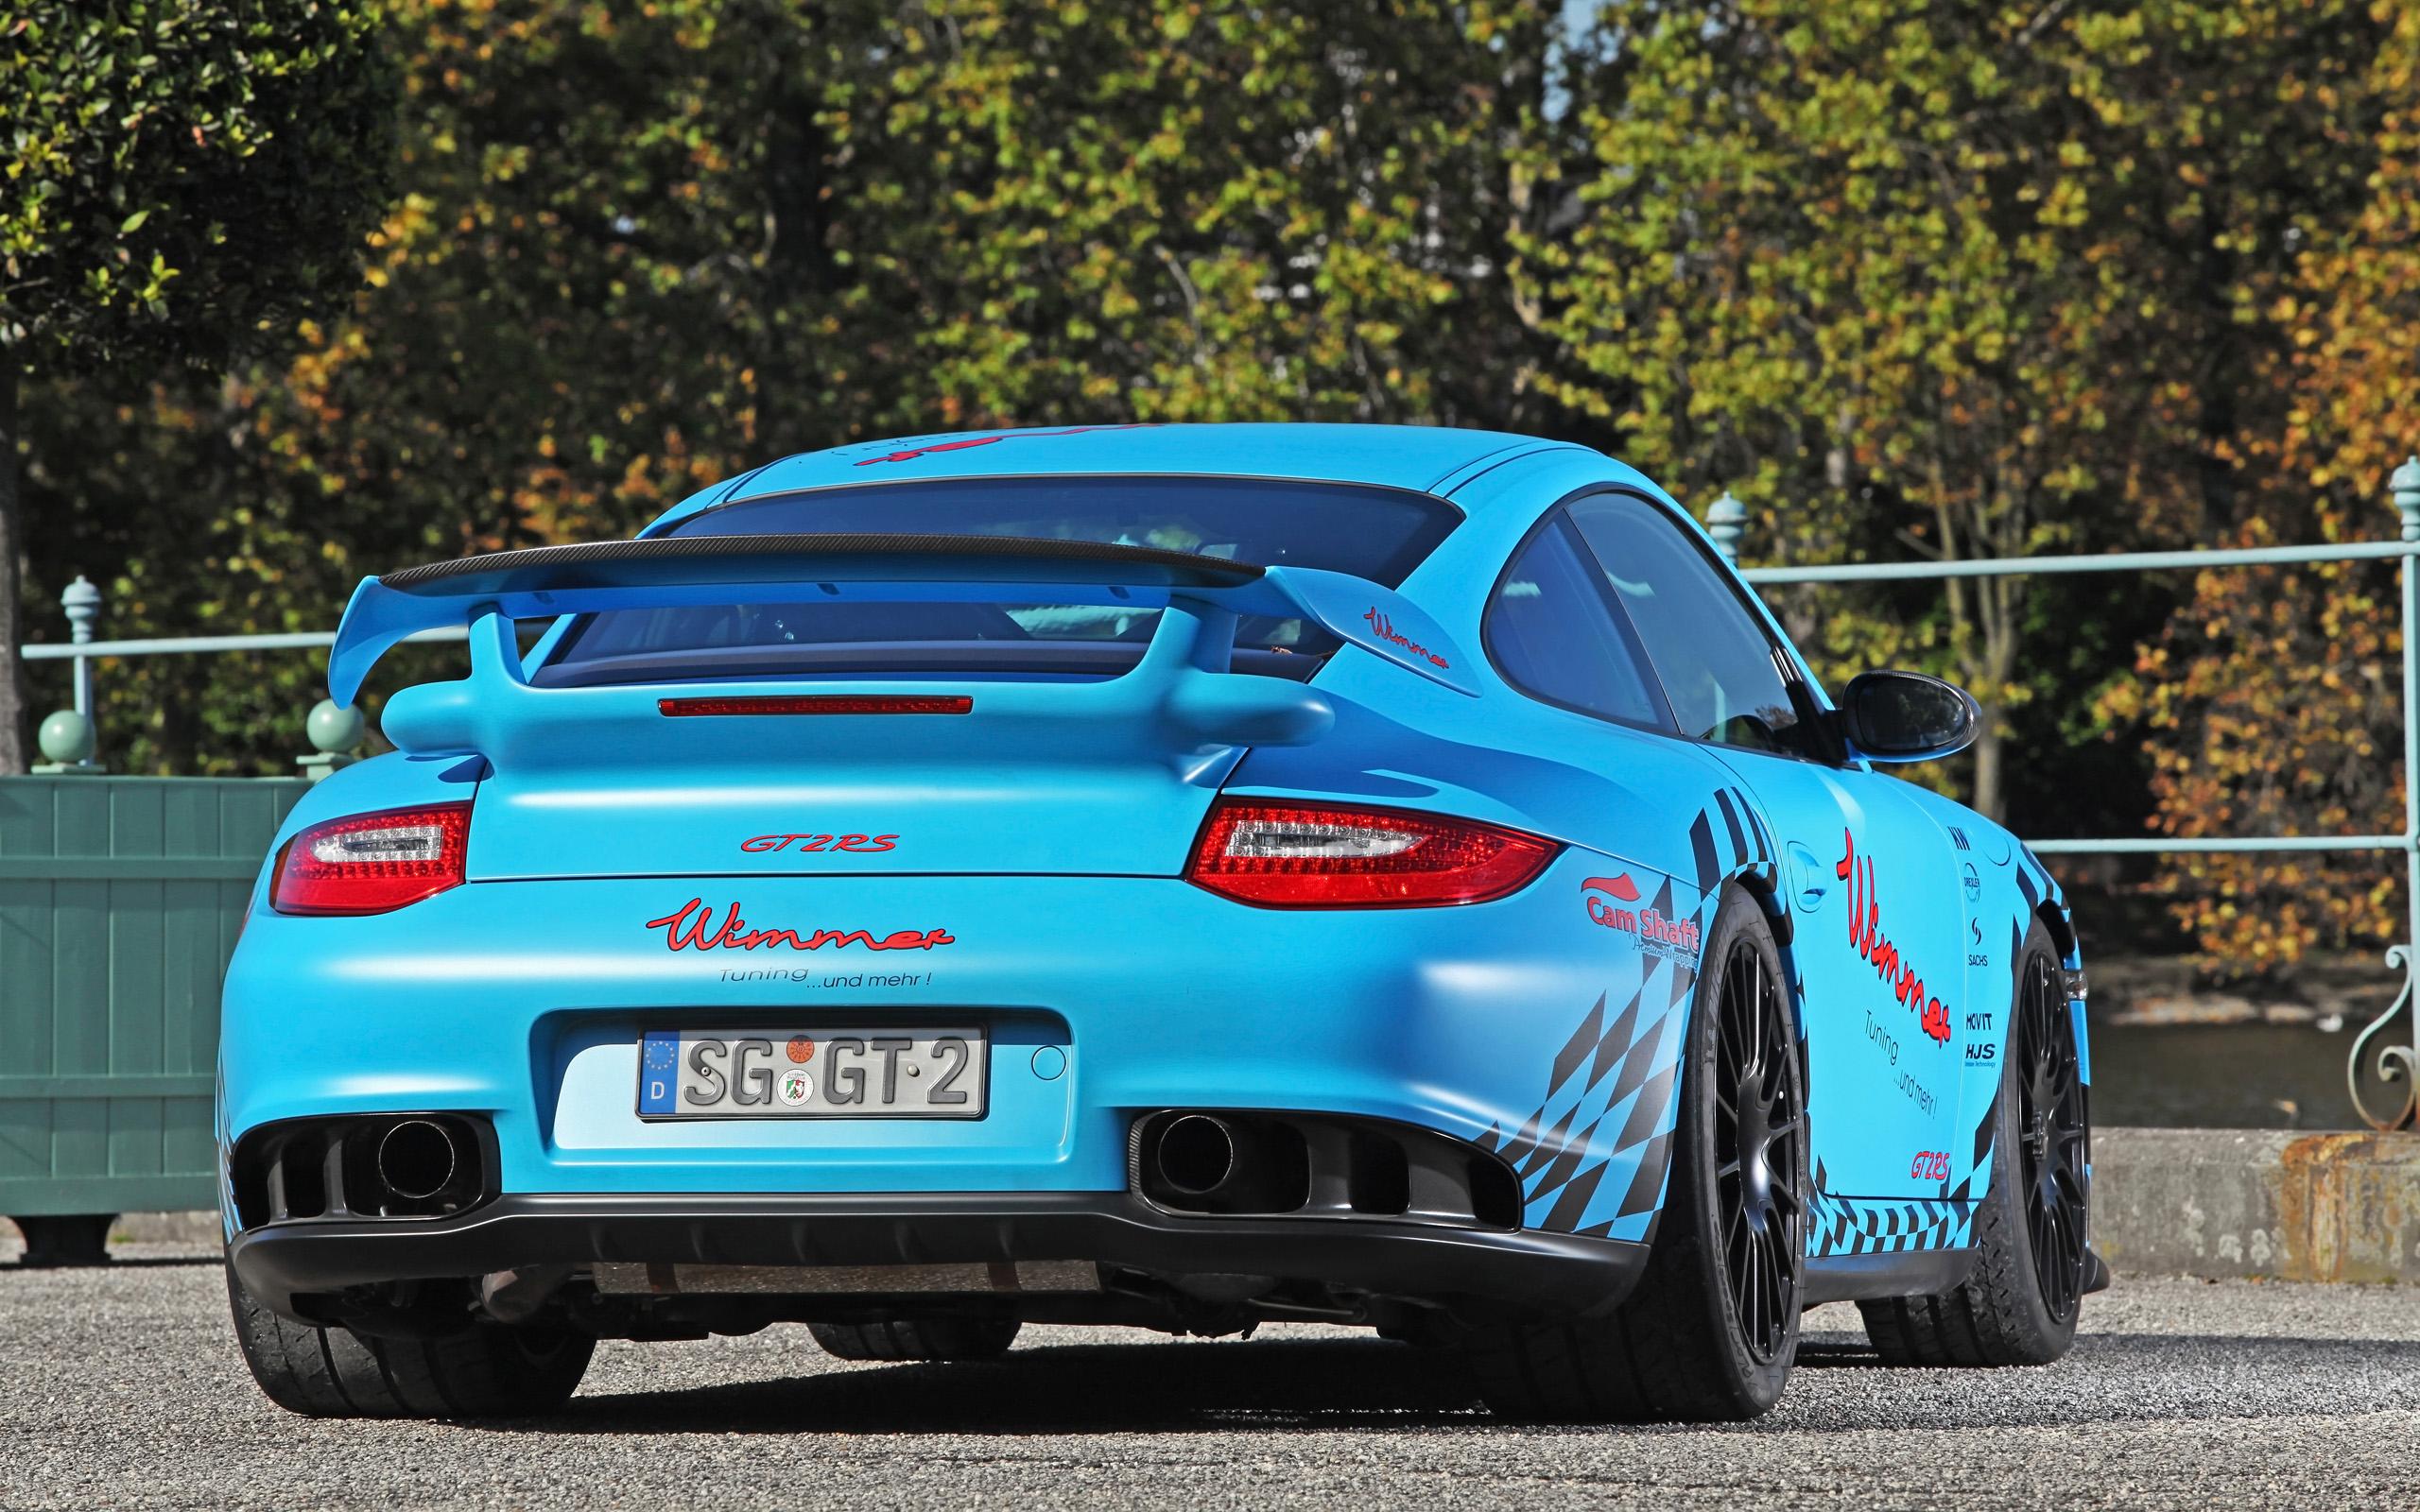 28f8588c7f7761630bdc402f52b09a53 Exciting Fanatec Porsche 911 Gt2 Wheel Kaufen Cars Trend